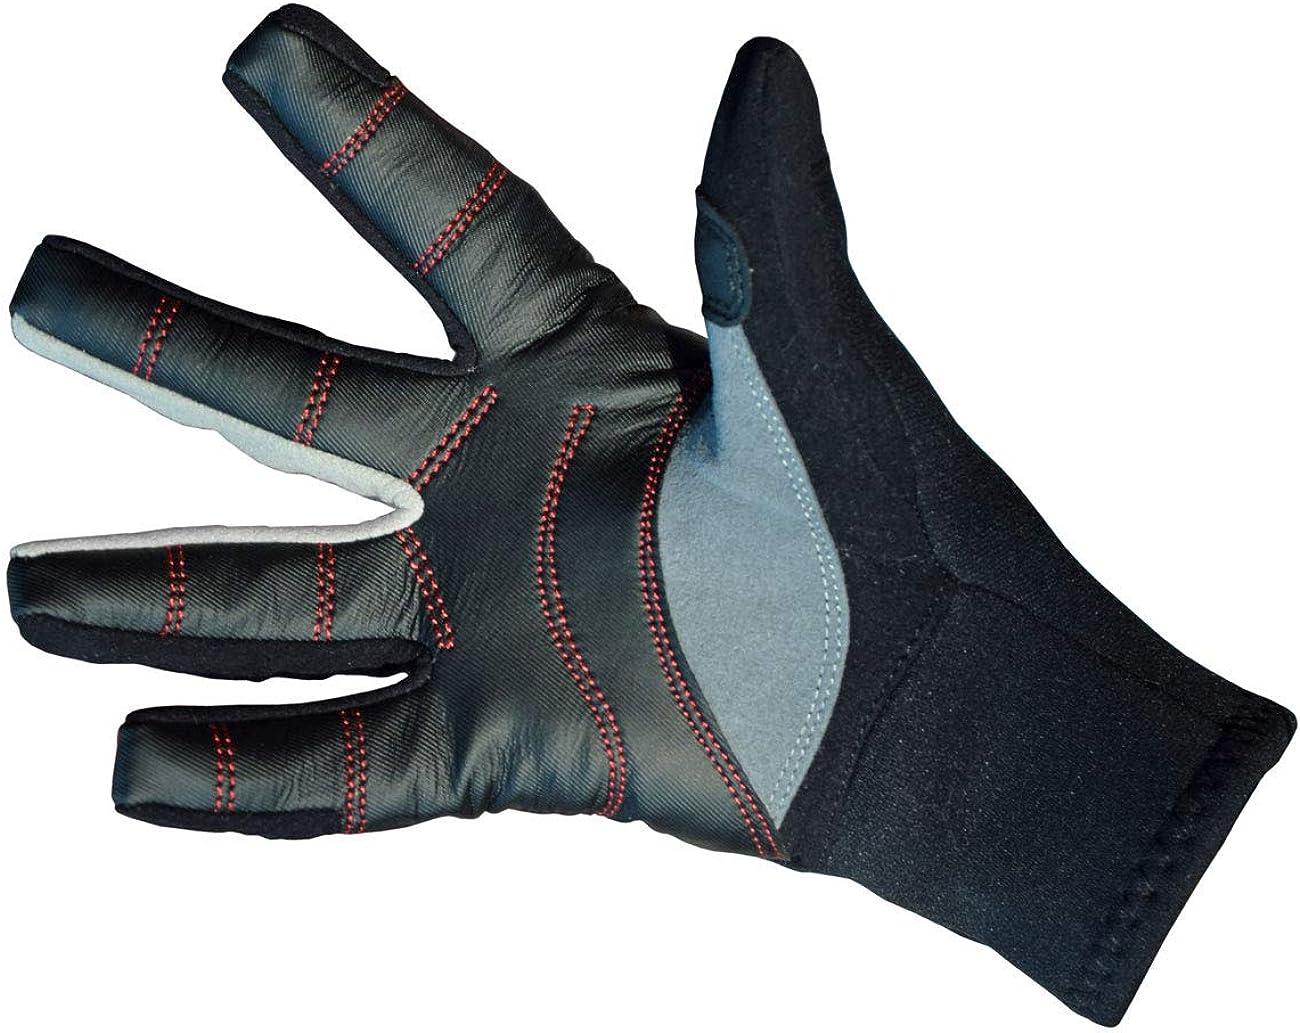 Large, Black GILL Three Season Gloves